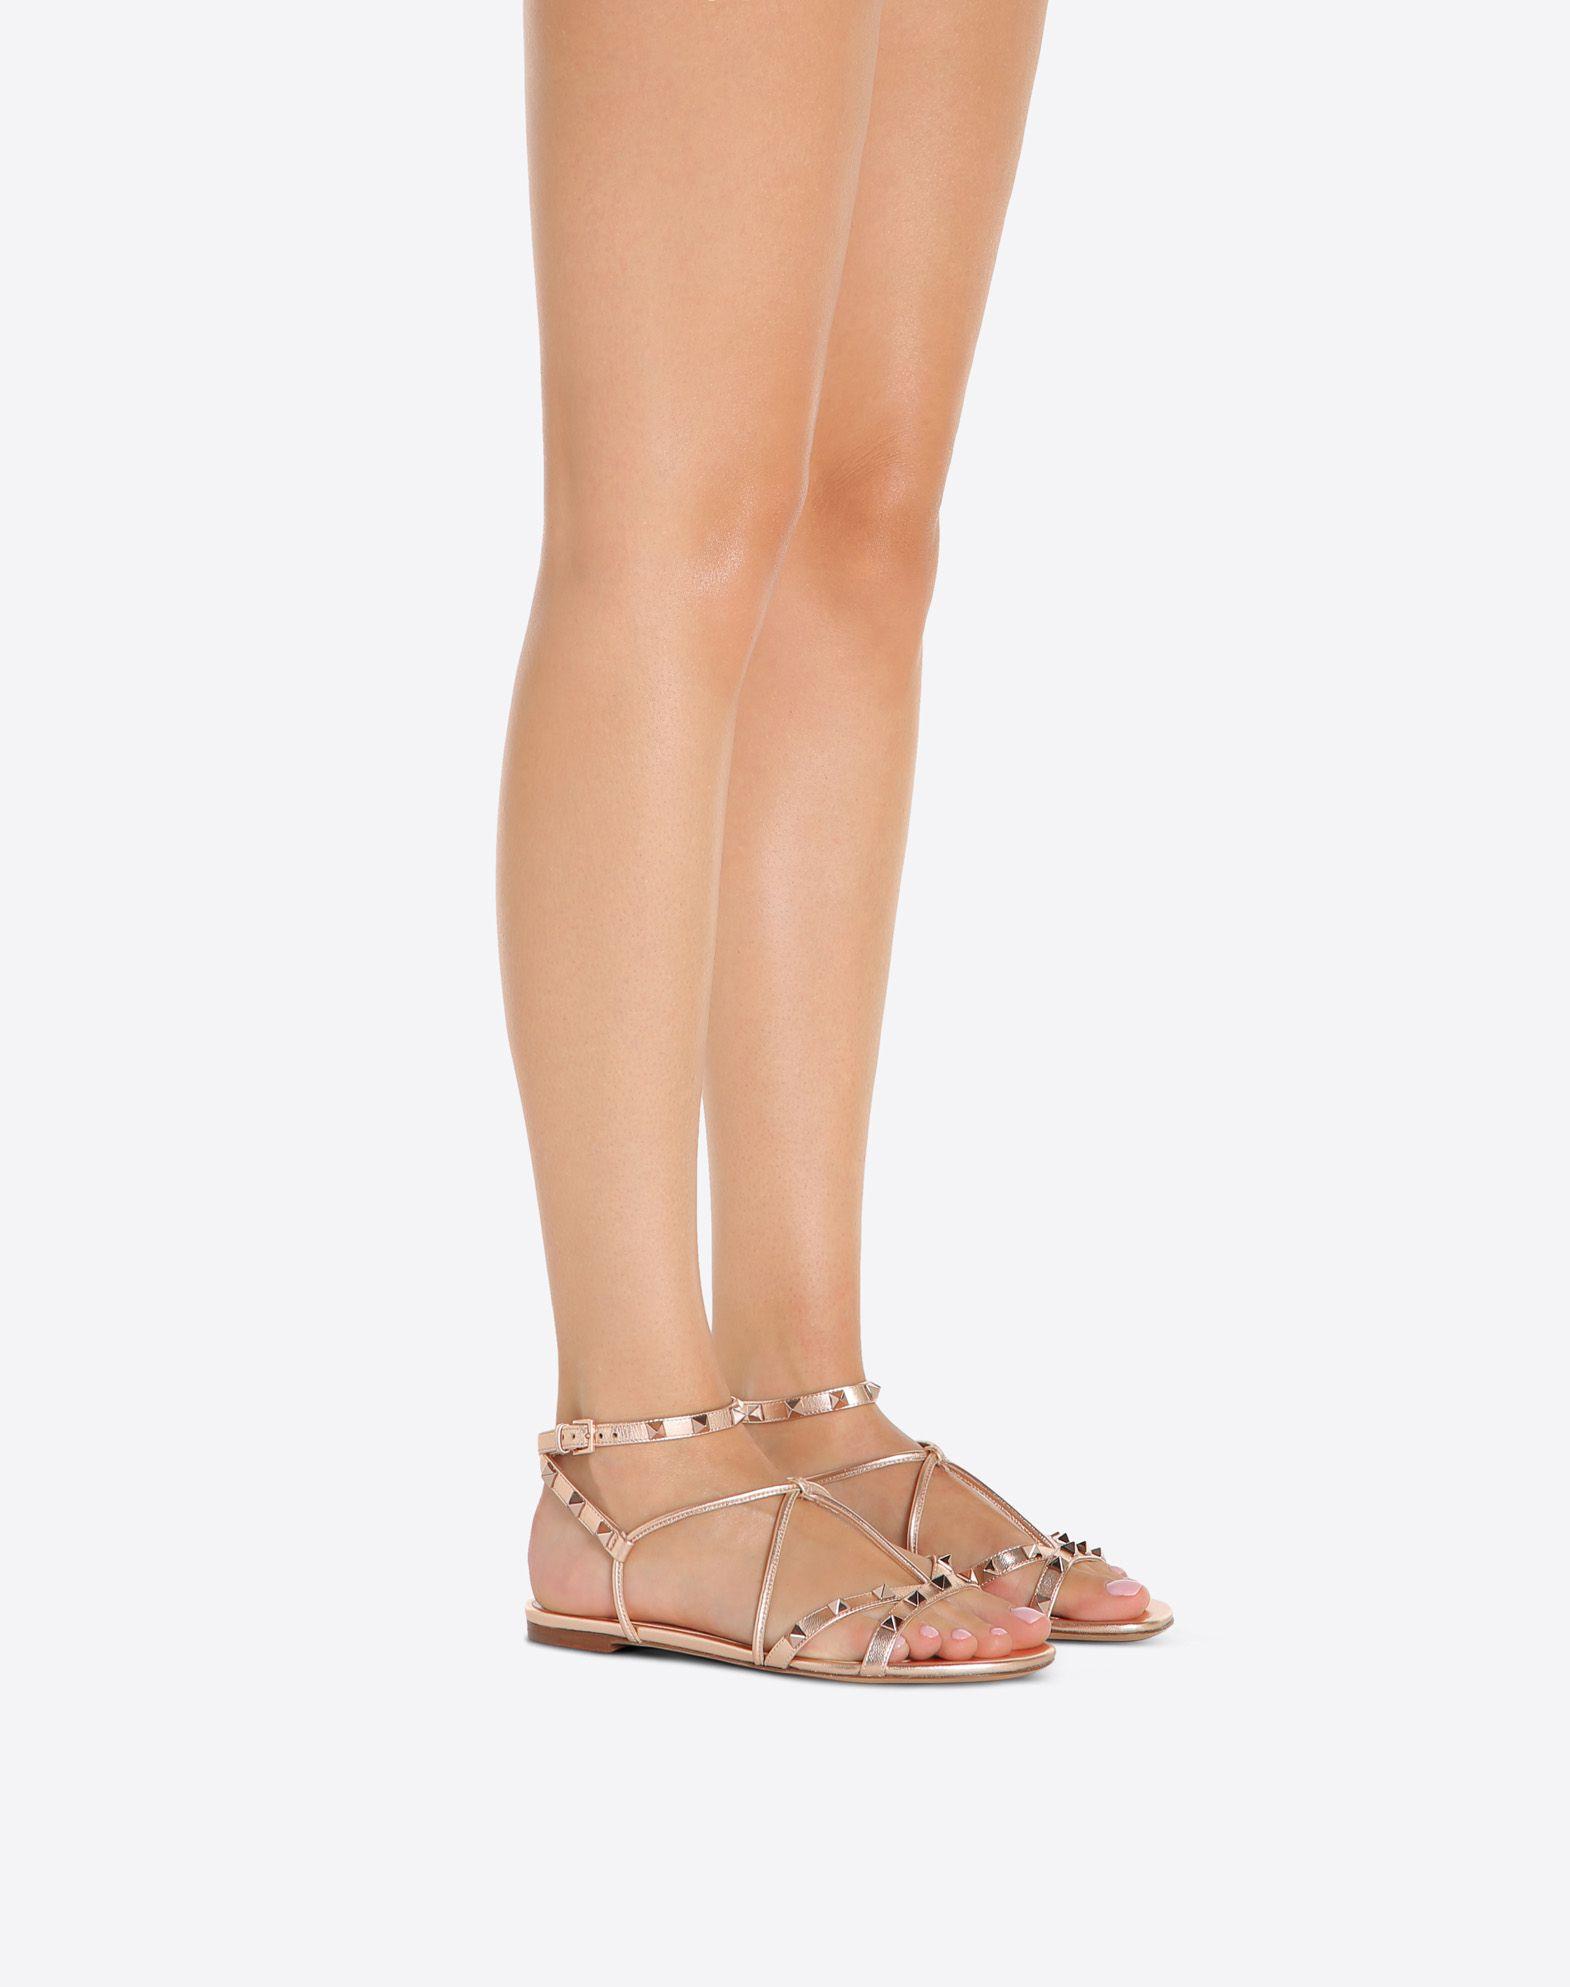 Free Rockstud Metallic Sandals in Copper Metallic Calf Valentino sHIWdVUrm